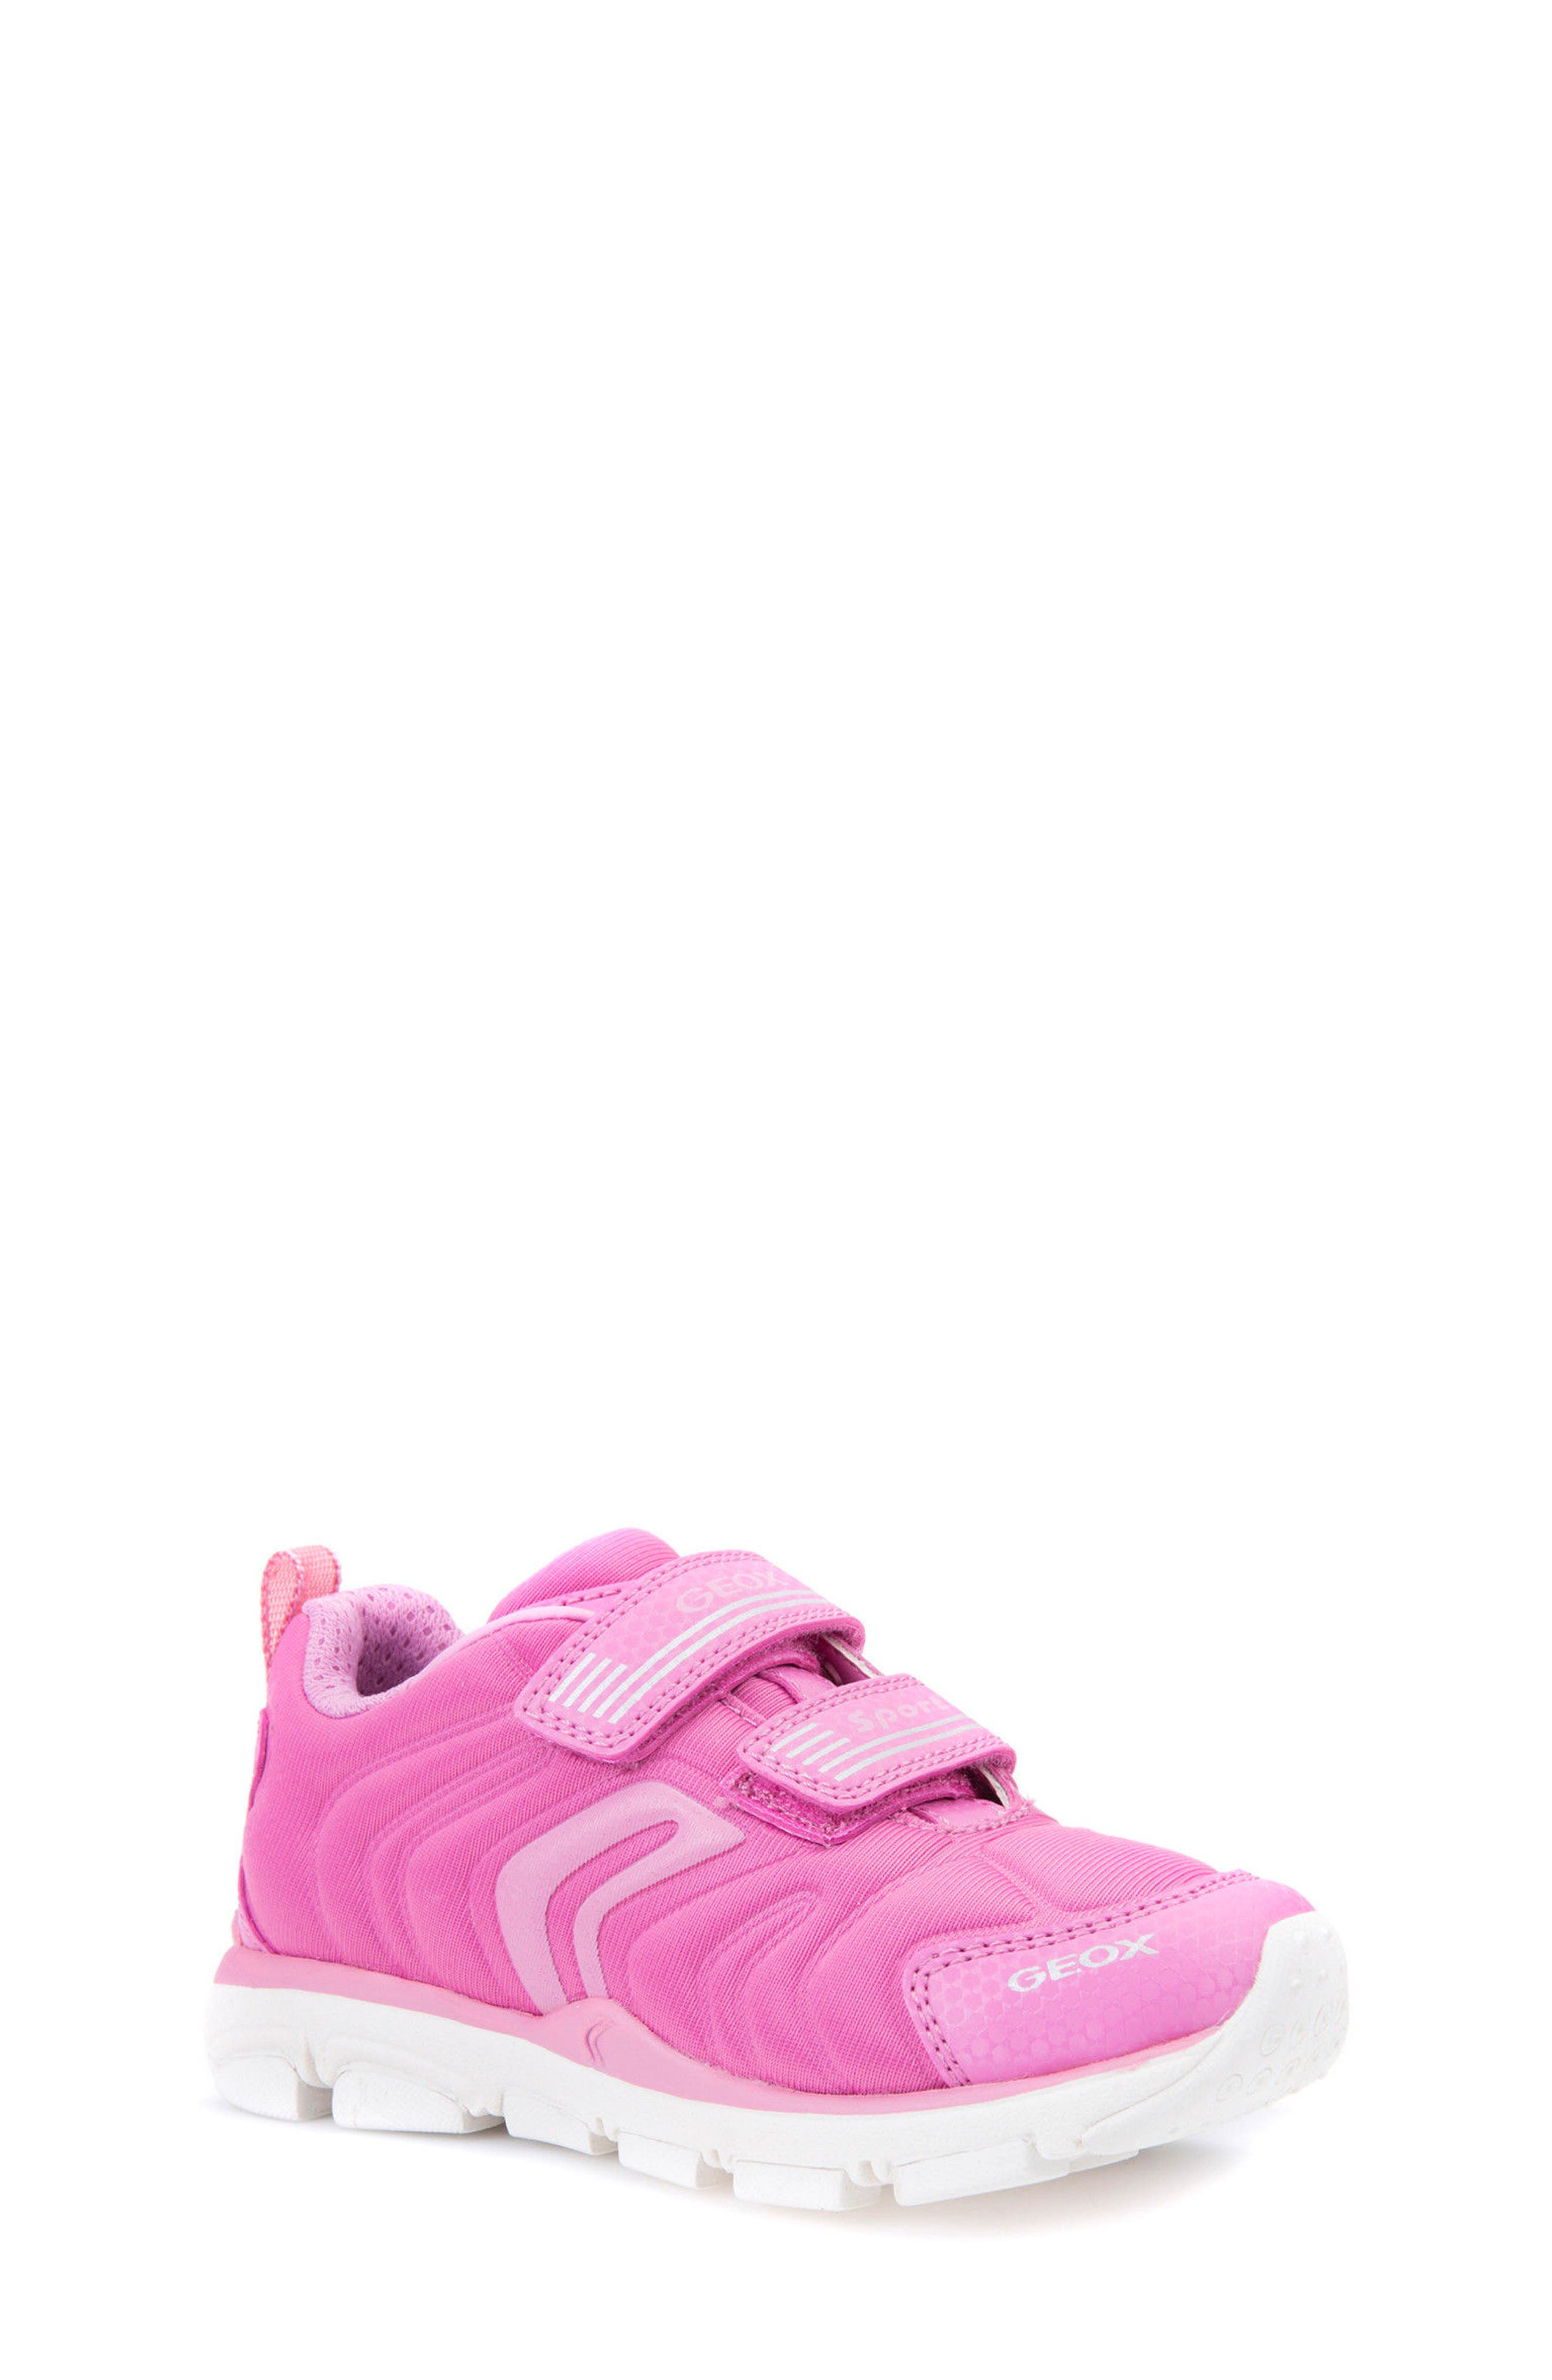 Torque Sneaker,                         Main,                         color, Fuchsia/ Dark Pink